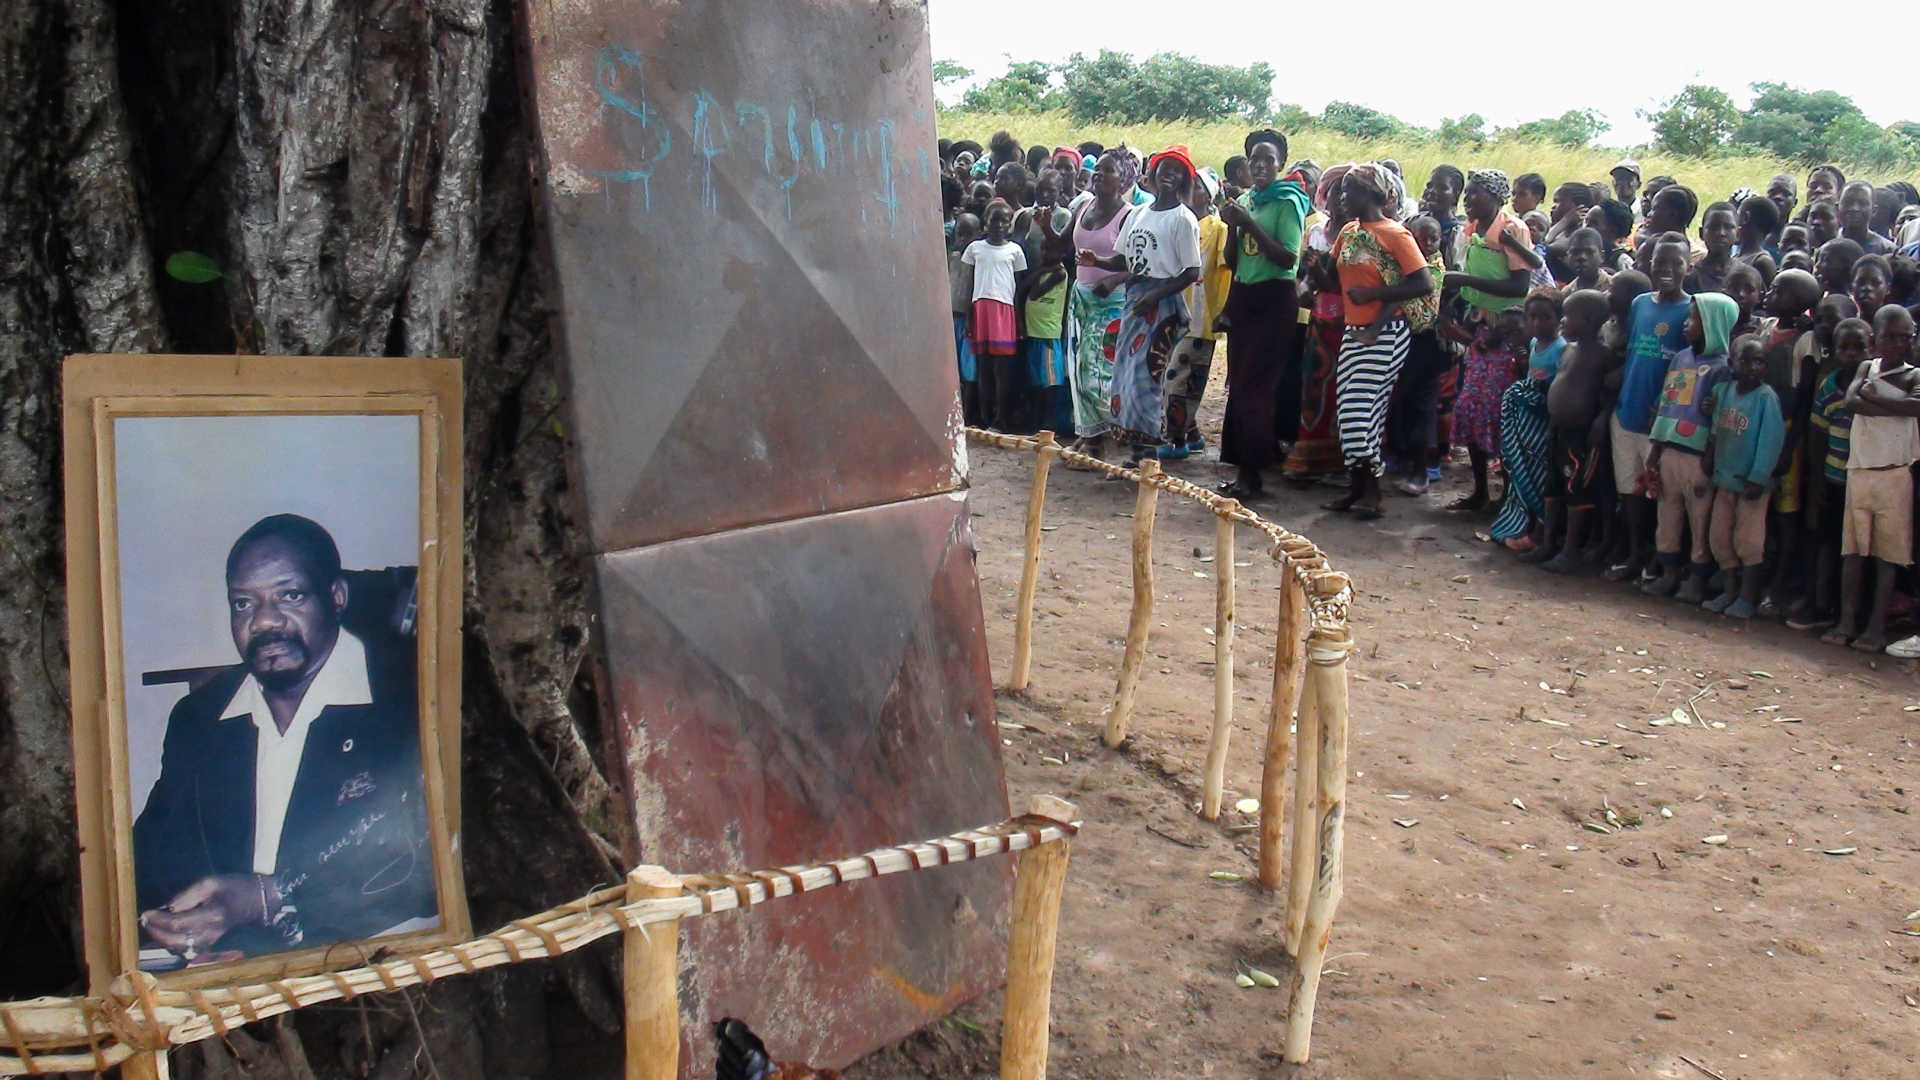 restos mortais de jonas savimbi foram exumados no luena - Enxuma    o SAVIMBI - Restos mortais de Jonas Savimbi foram exumados no Luena